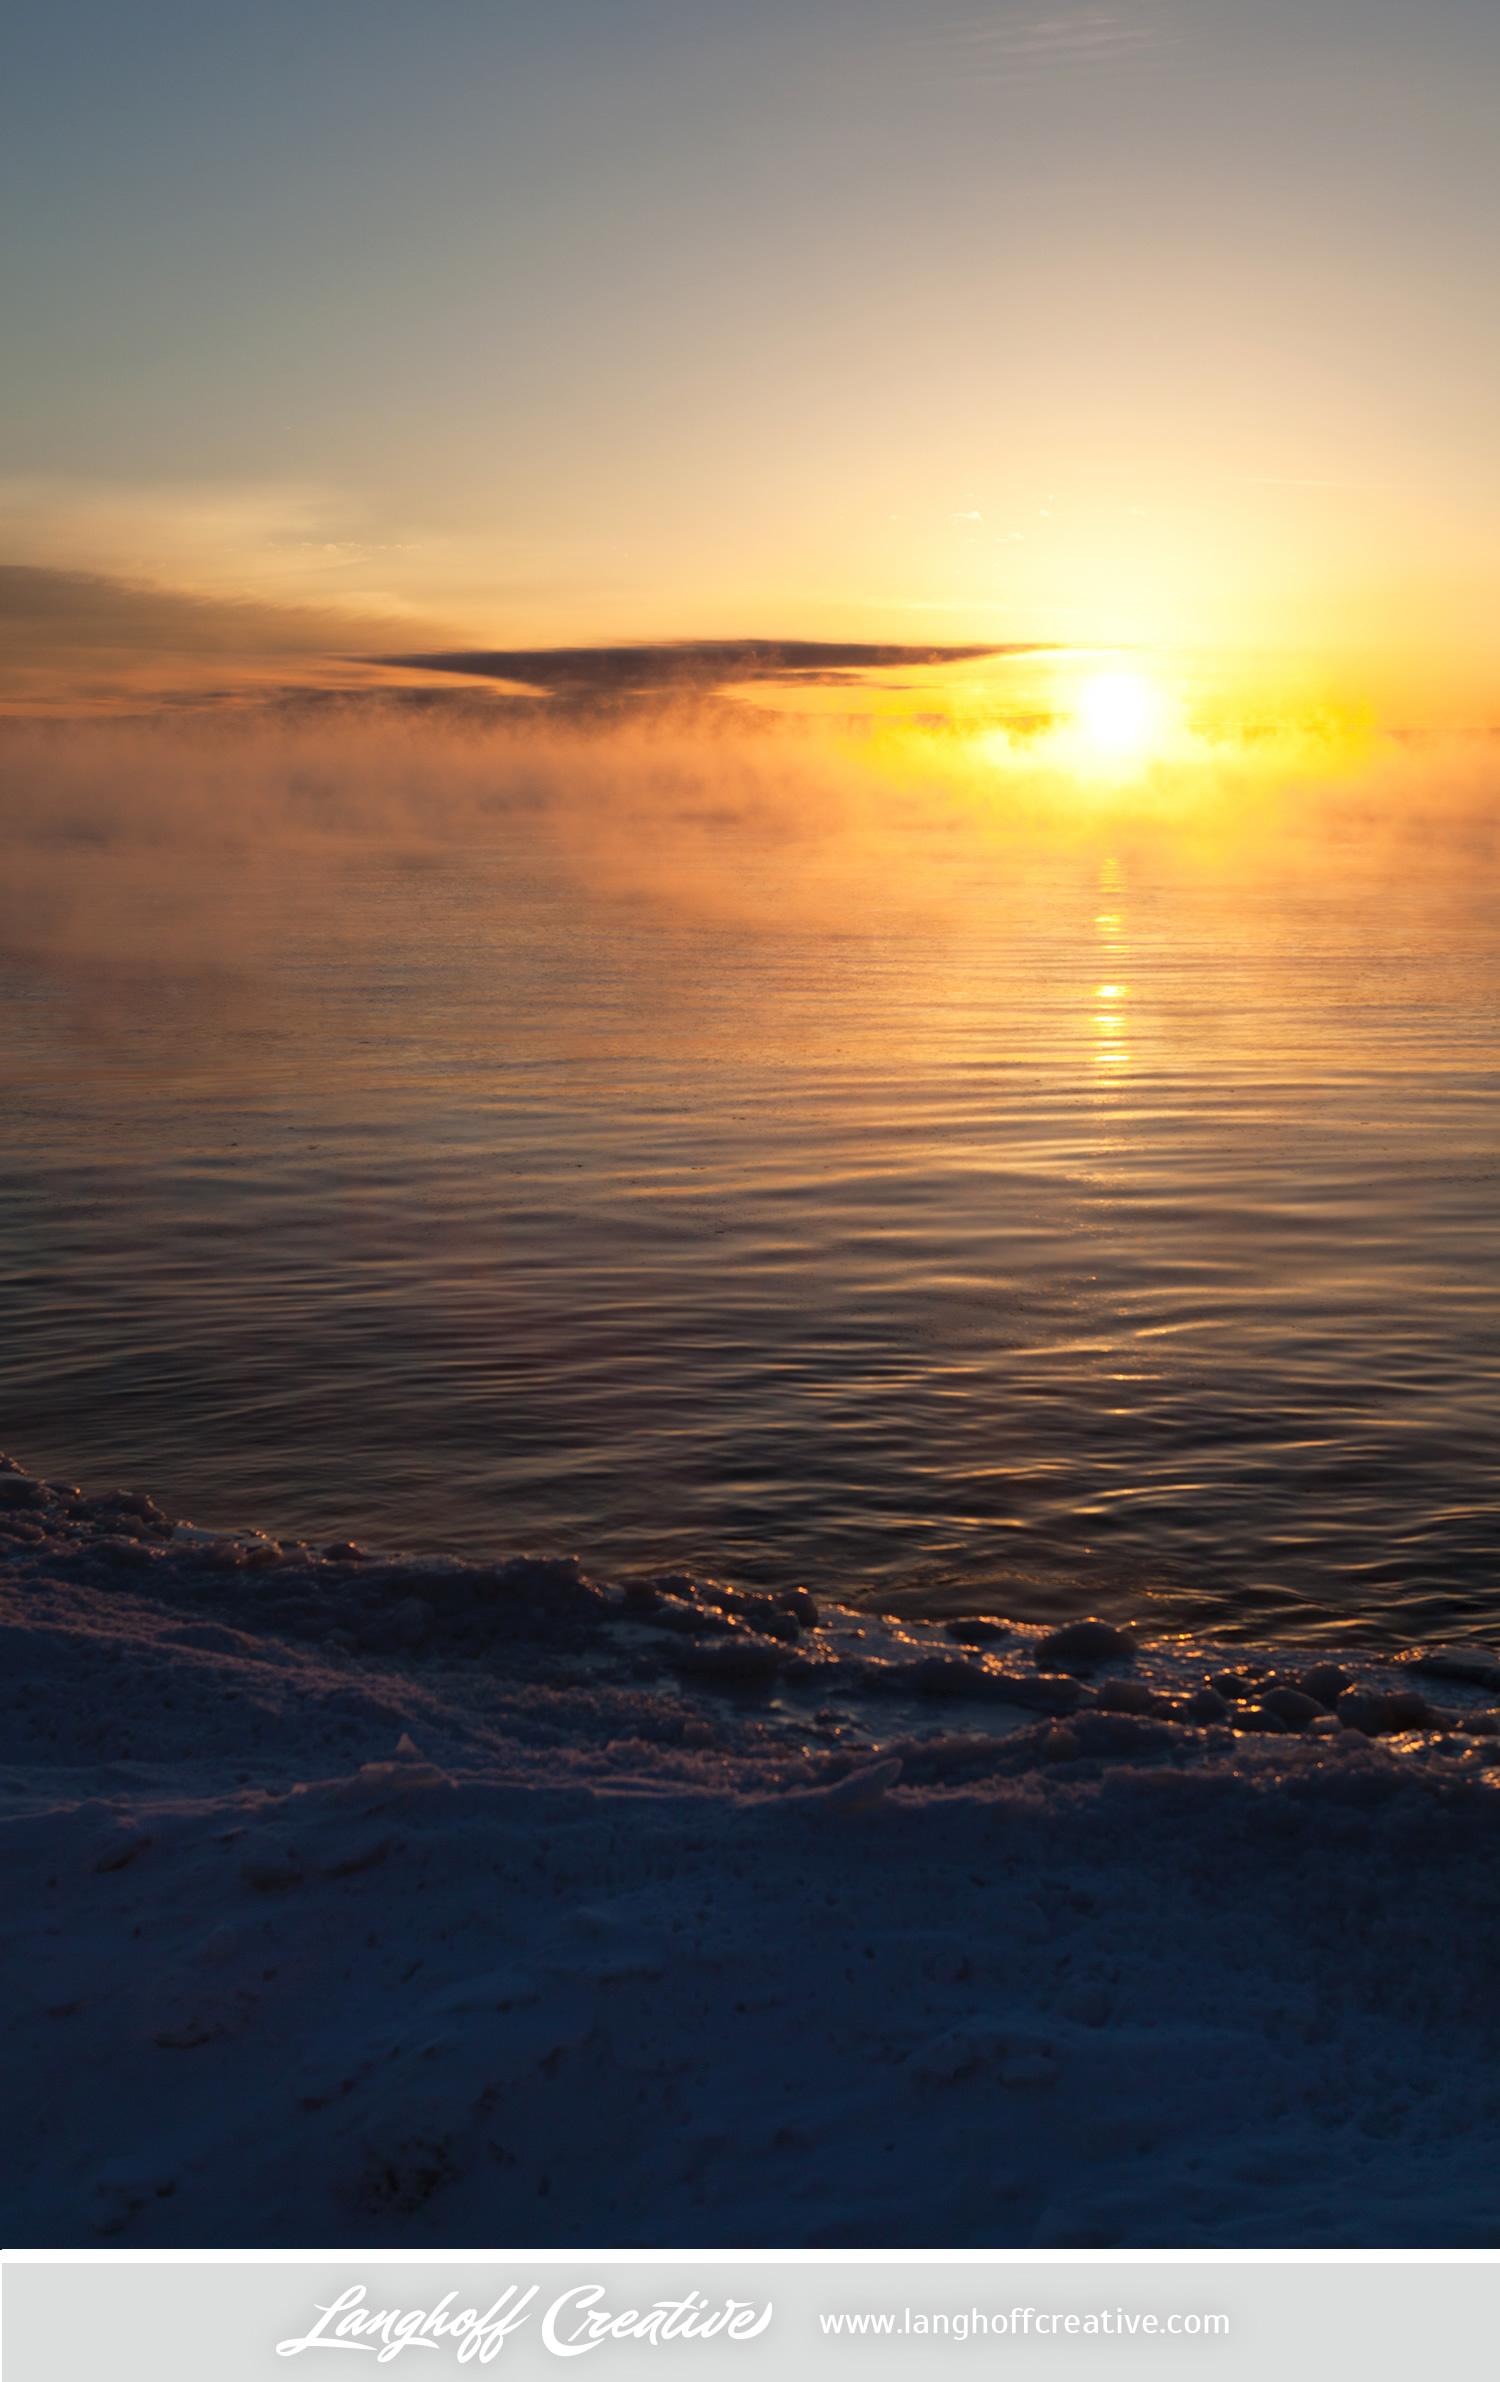 LanghoffCreative-LakeMichigan-winter-sunrise-Kenosha-Jan03-2014-photo-5.jpg